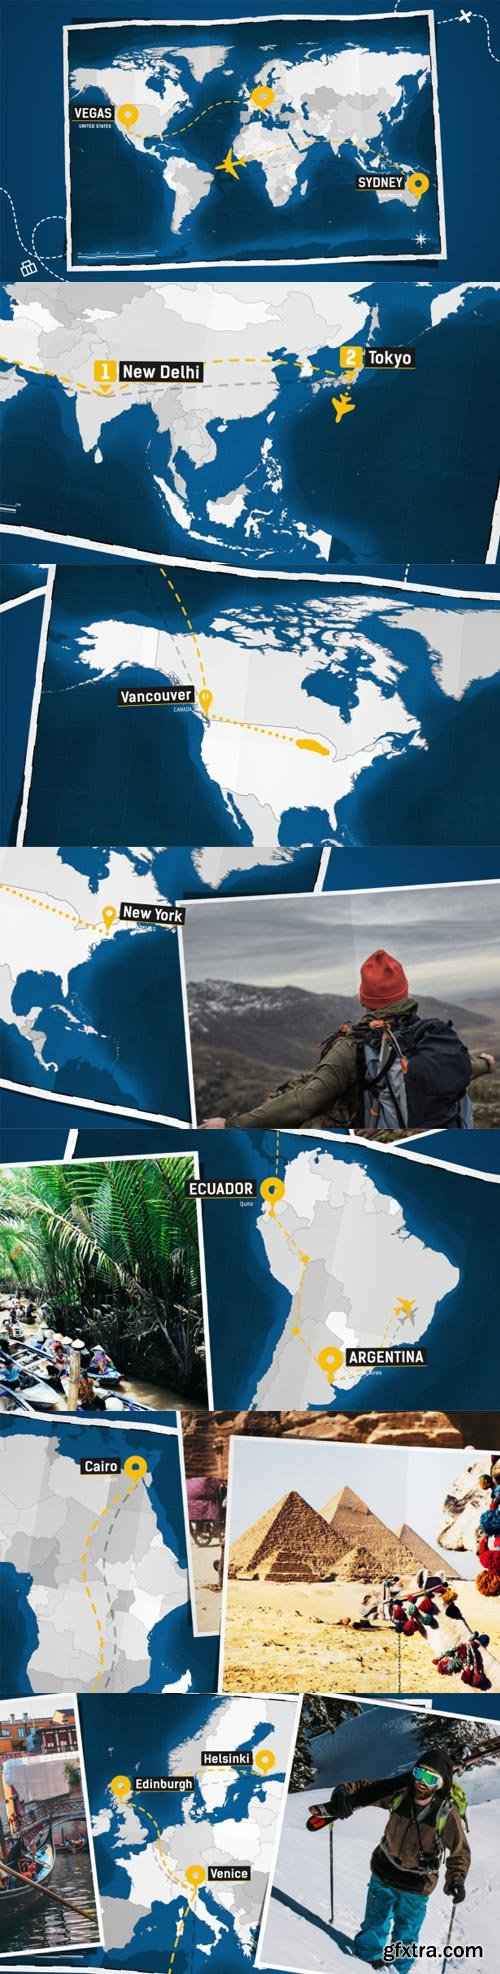 Videohive - Travel Map - Promo Kit - 21811145